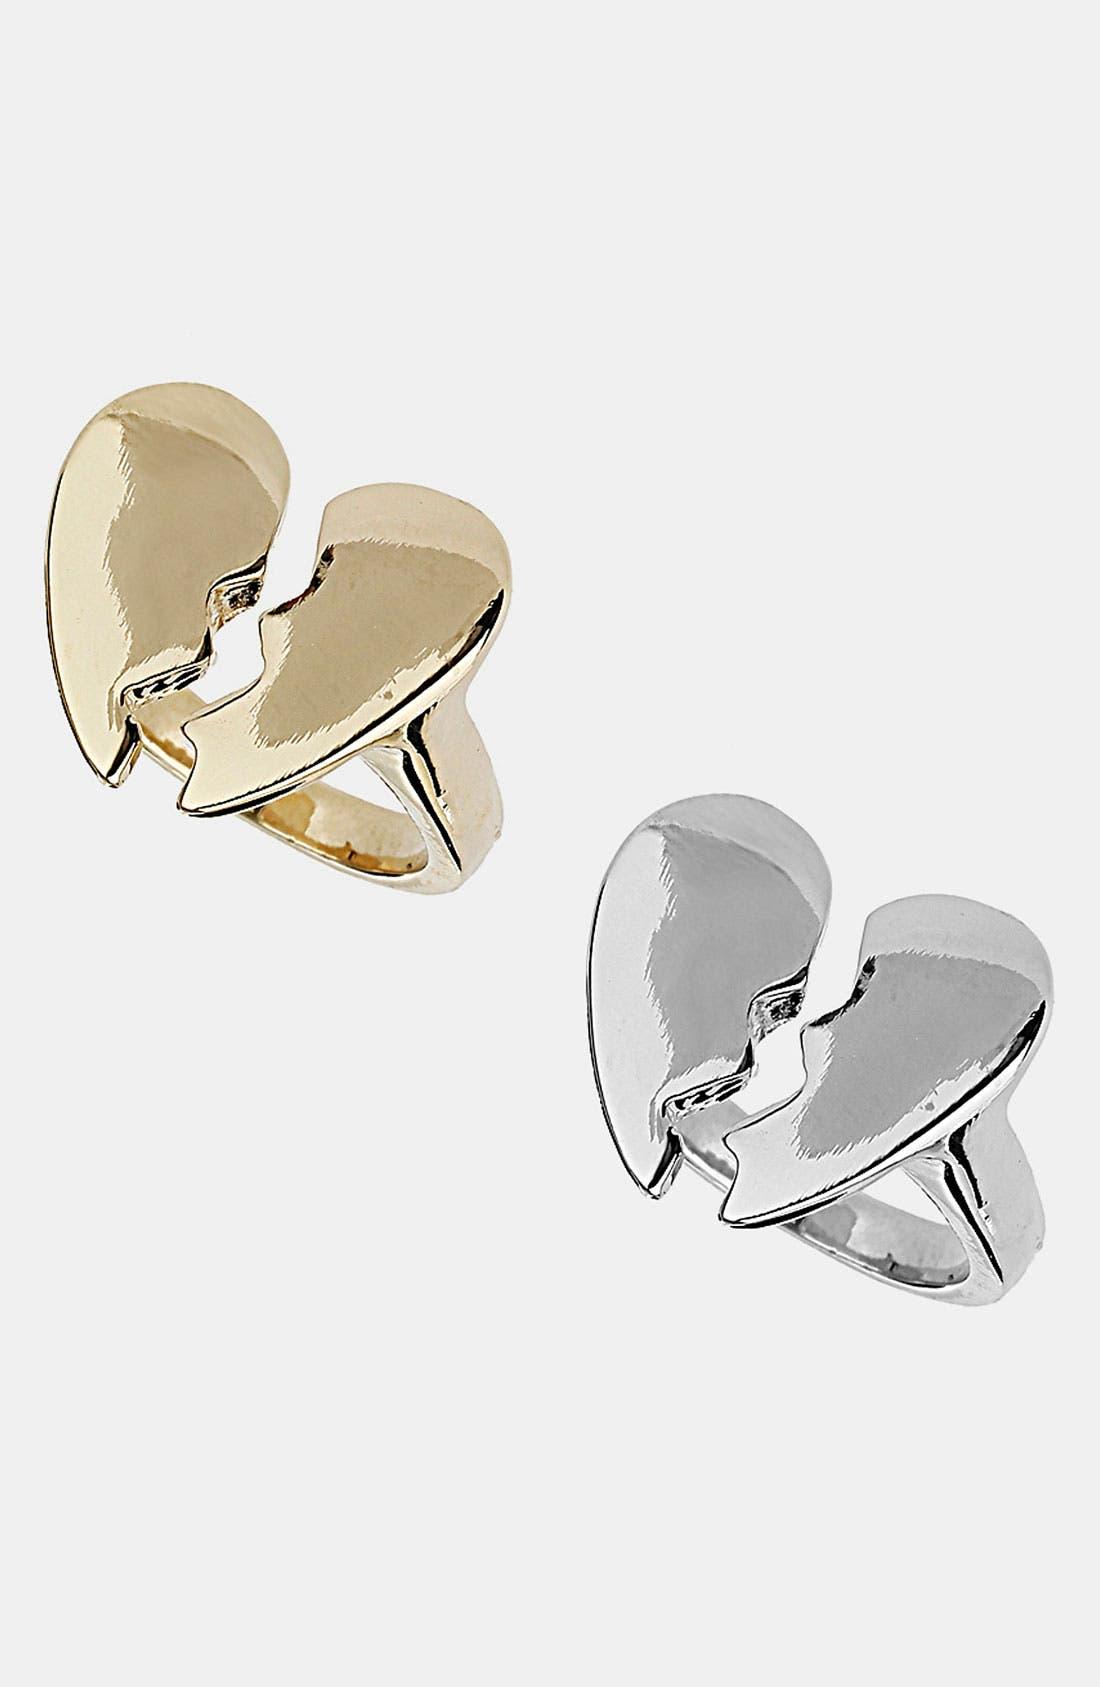 Alternate Image 1 Selected - Topshop 'Broken Heart' Rings (Set of 2)